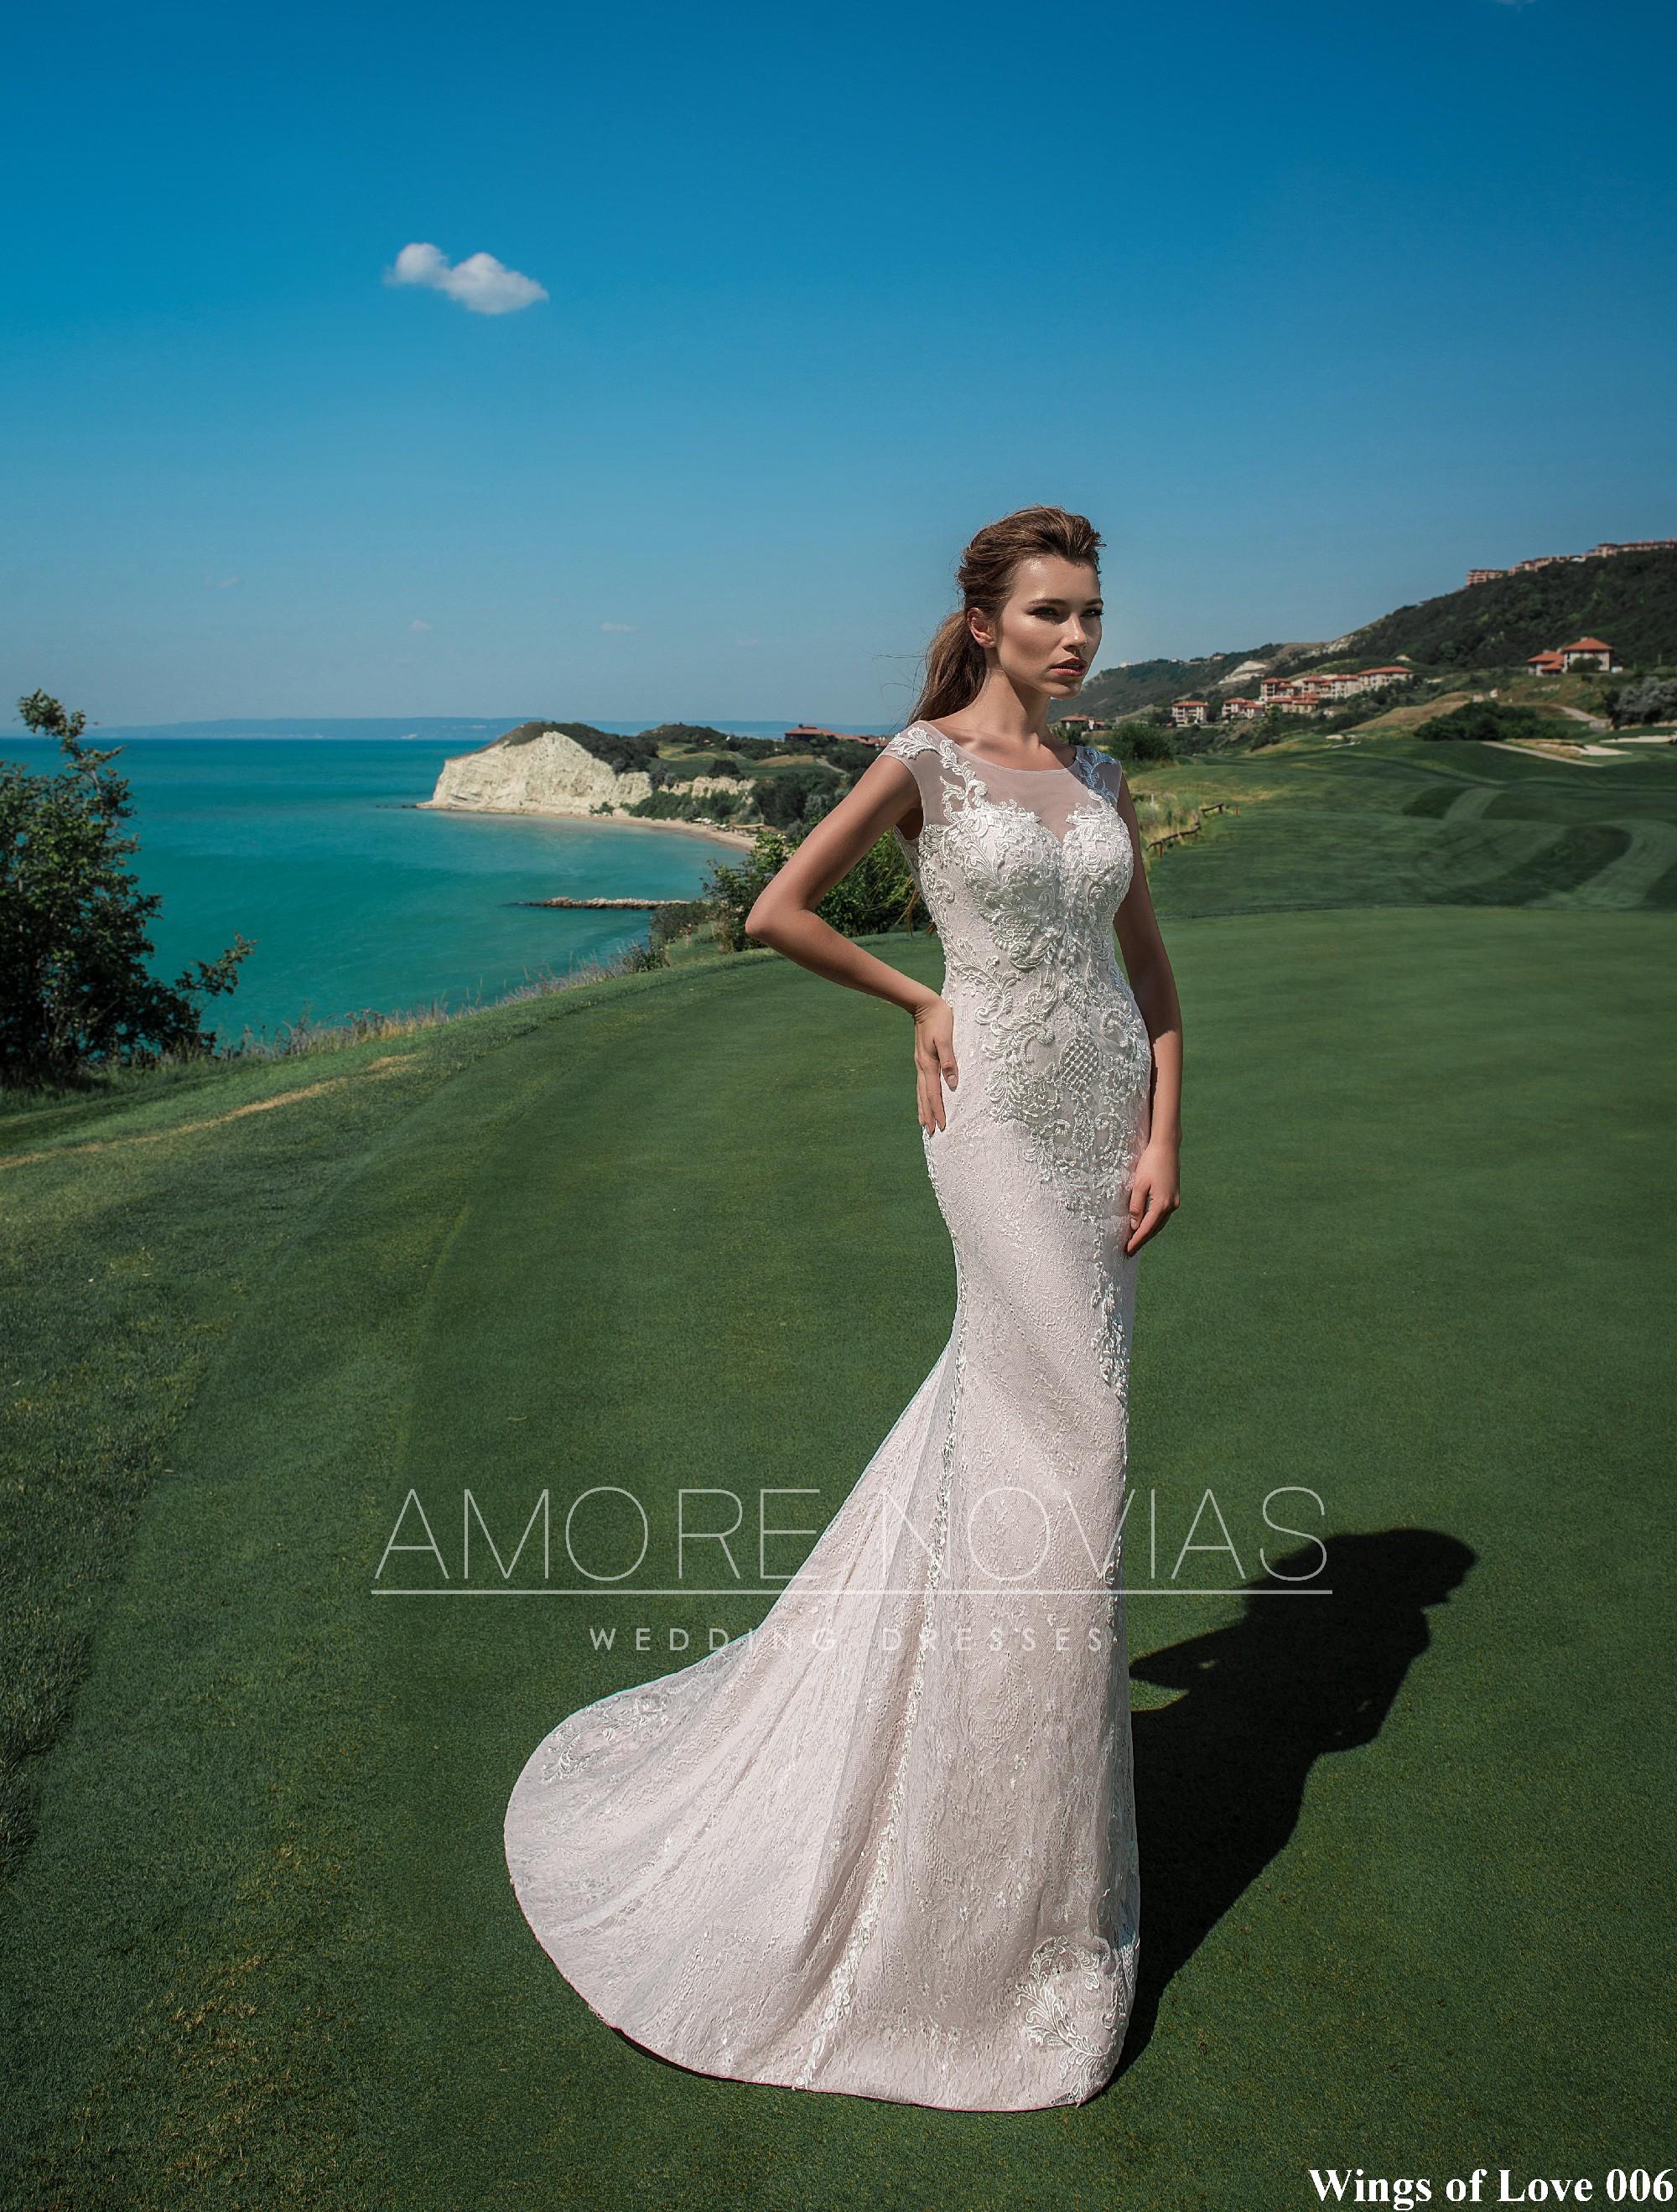 http://amore-novias.com/images/stories/virtuemart/product/lk-006-------(1).jpg